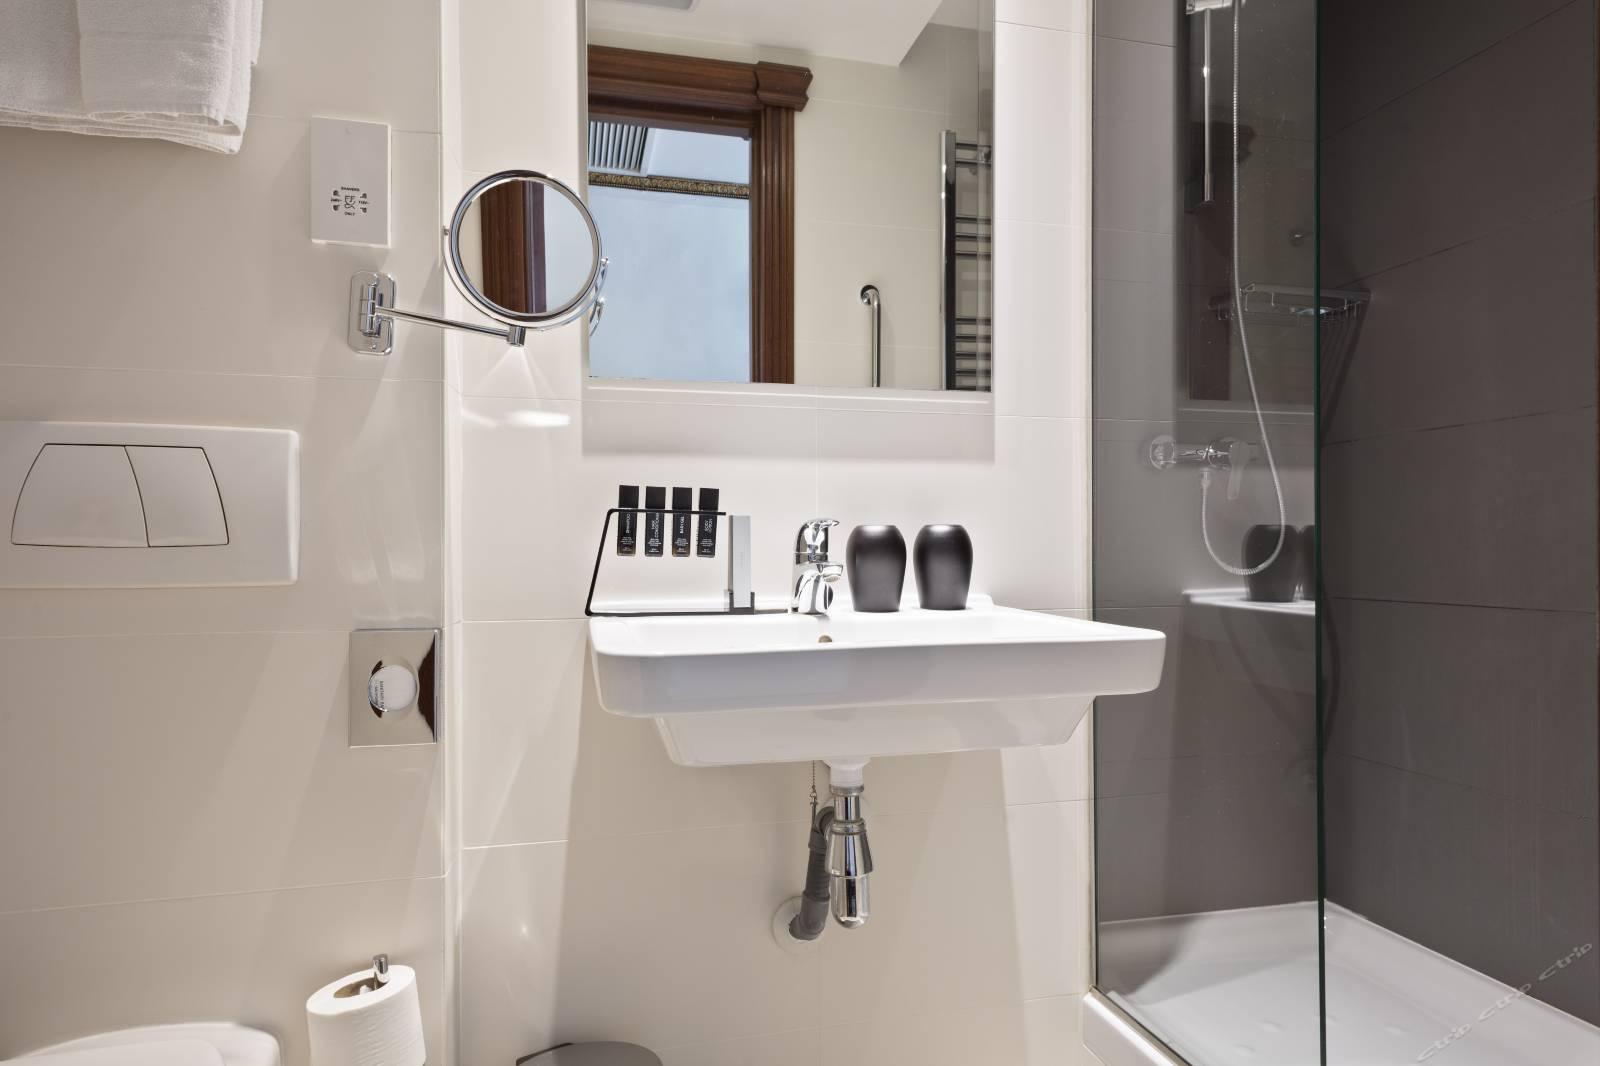 KEDIBO useful ceramic wall hung basin grab now for commercial apartment-13